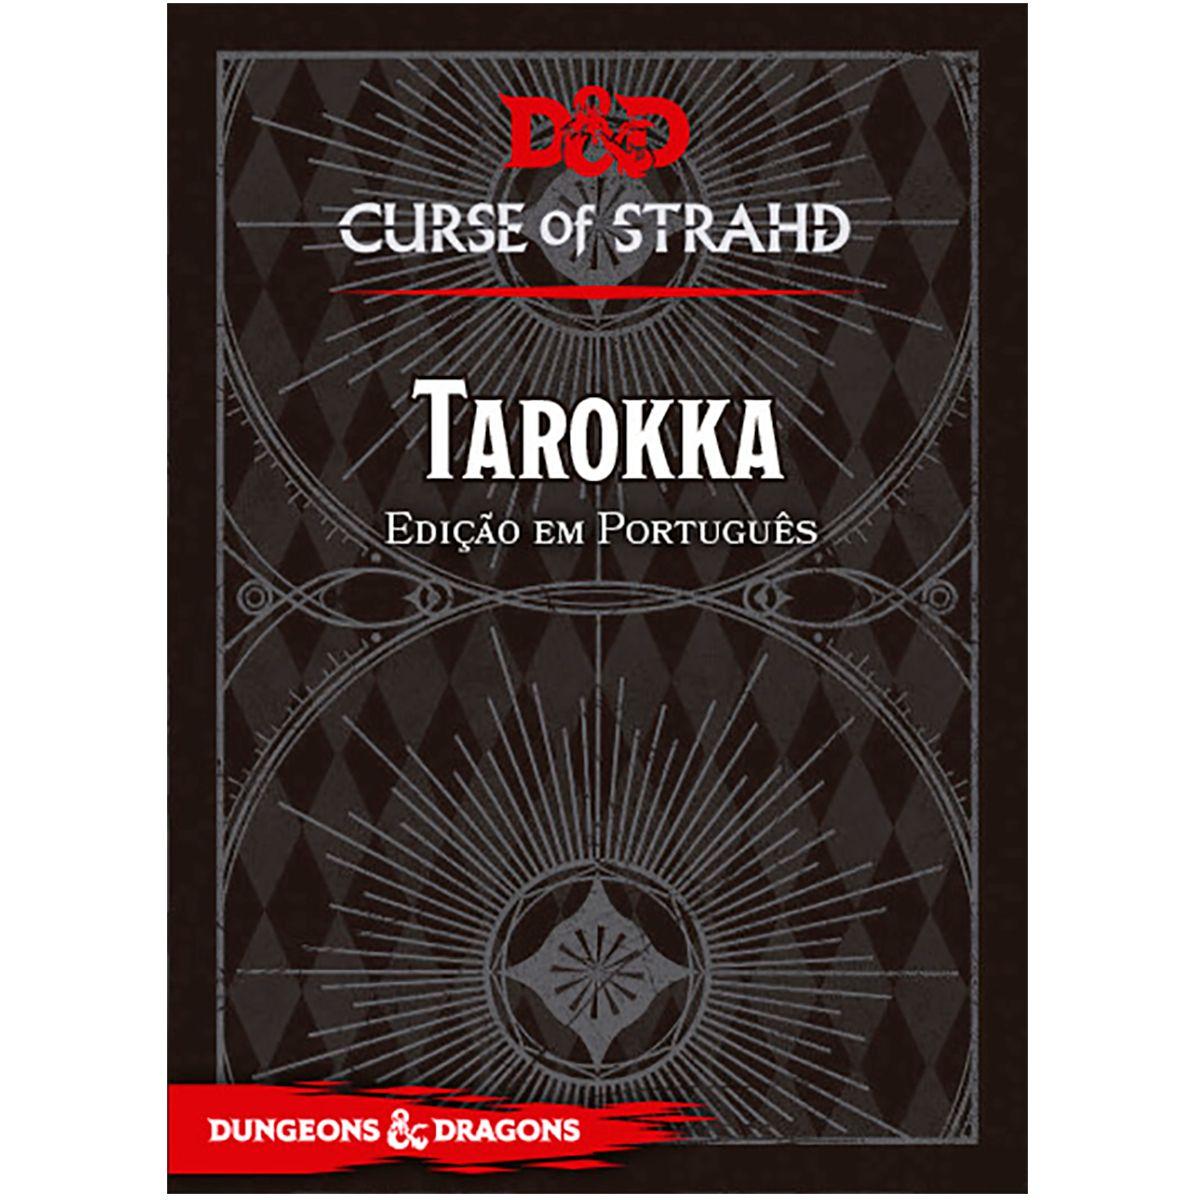 Dungeons and Dragons Curse of Strahd Tarokka Deck Rpg